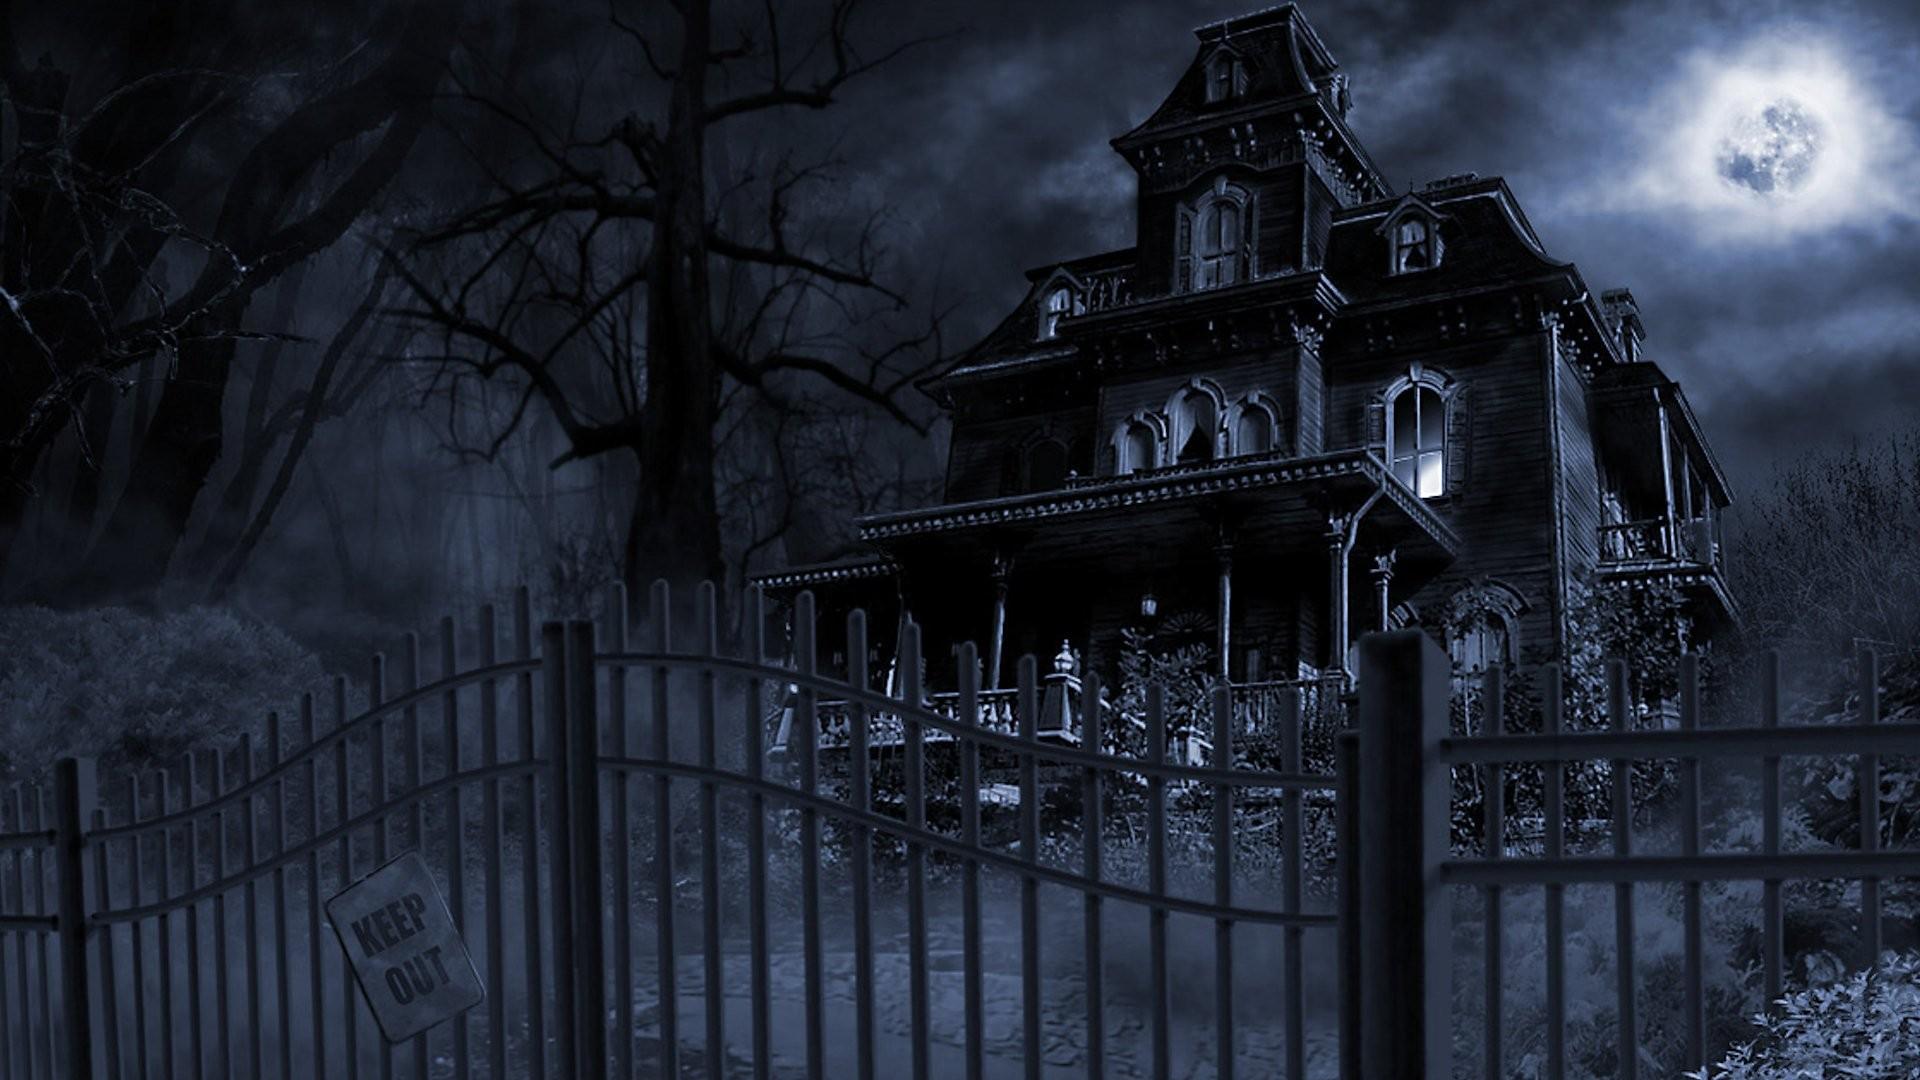 Haunted House wallpaper   808732 1920x1080